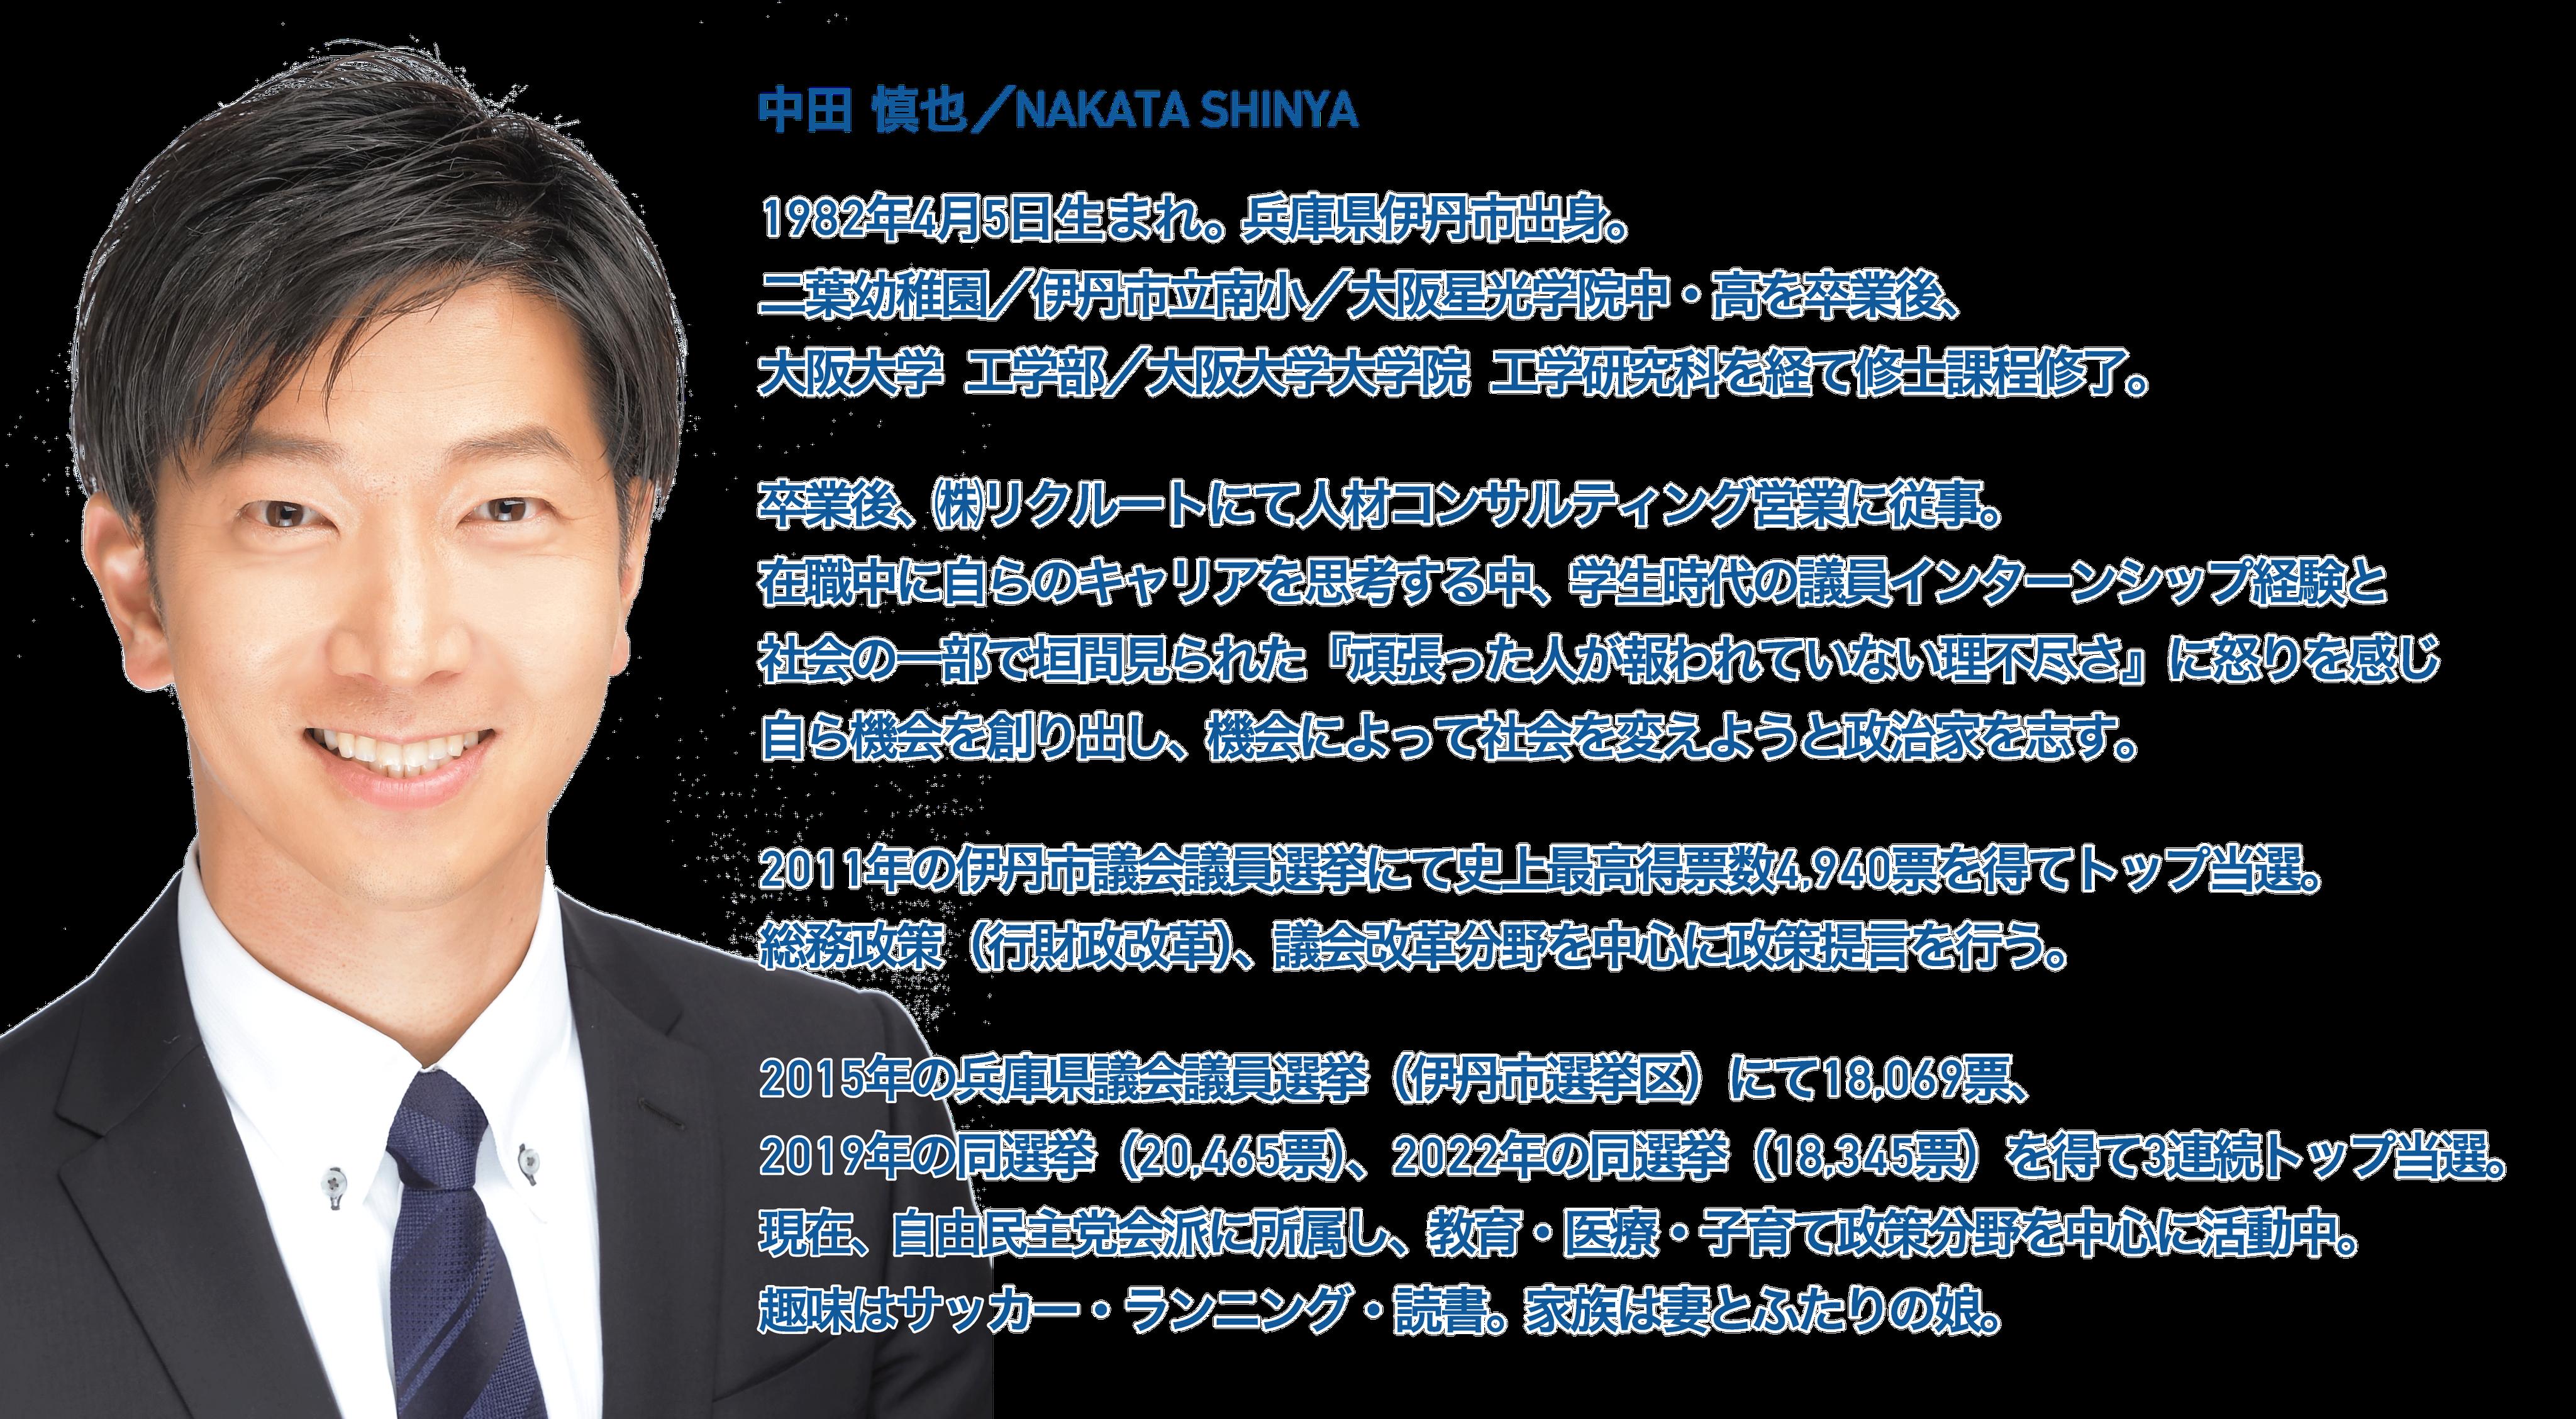 ■自己紹介文■